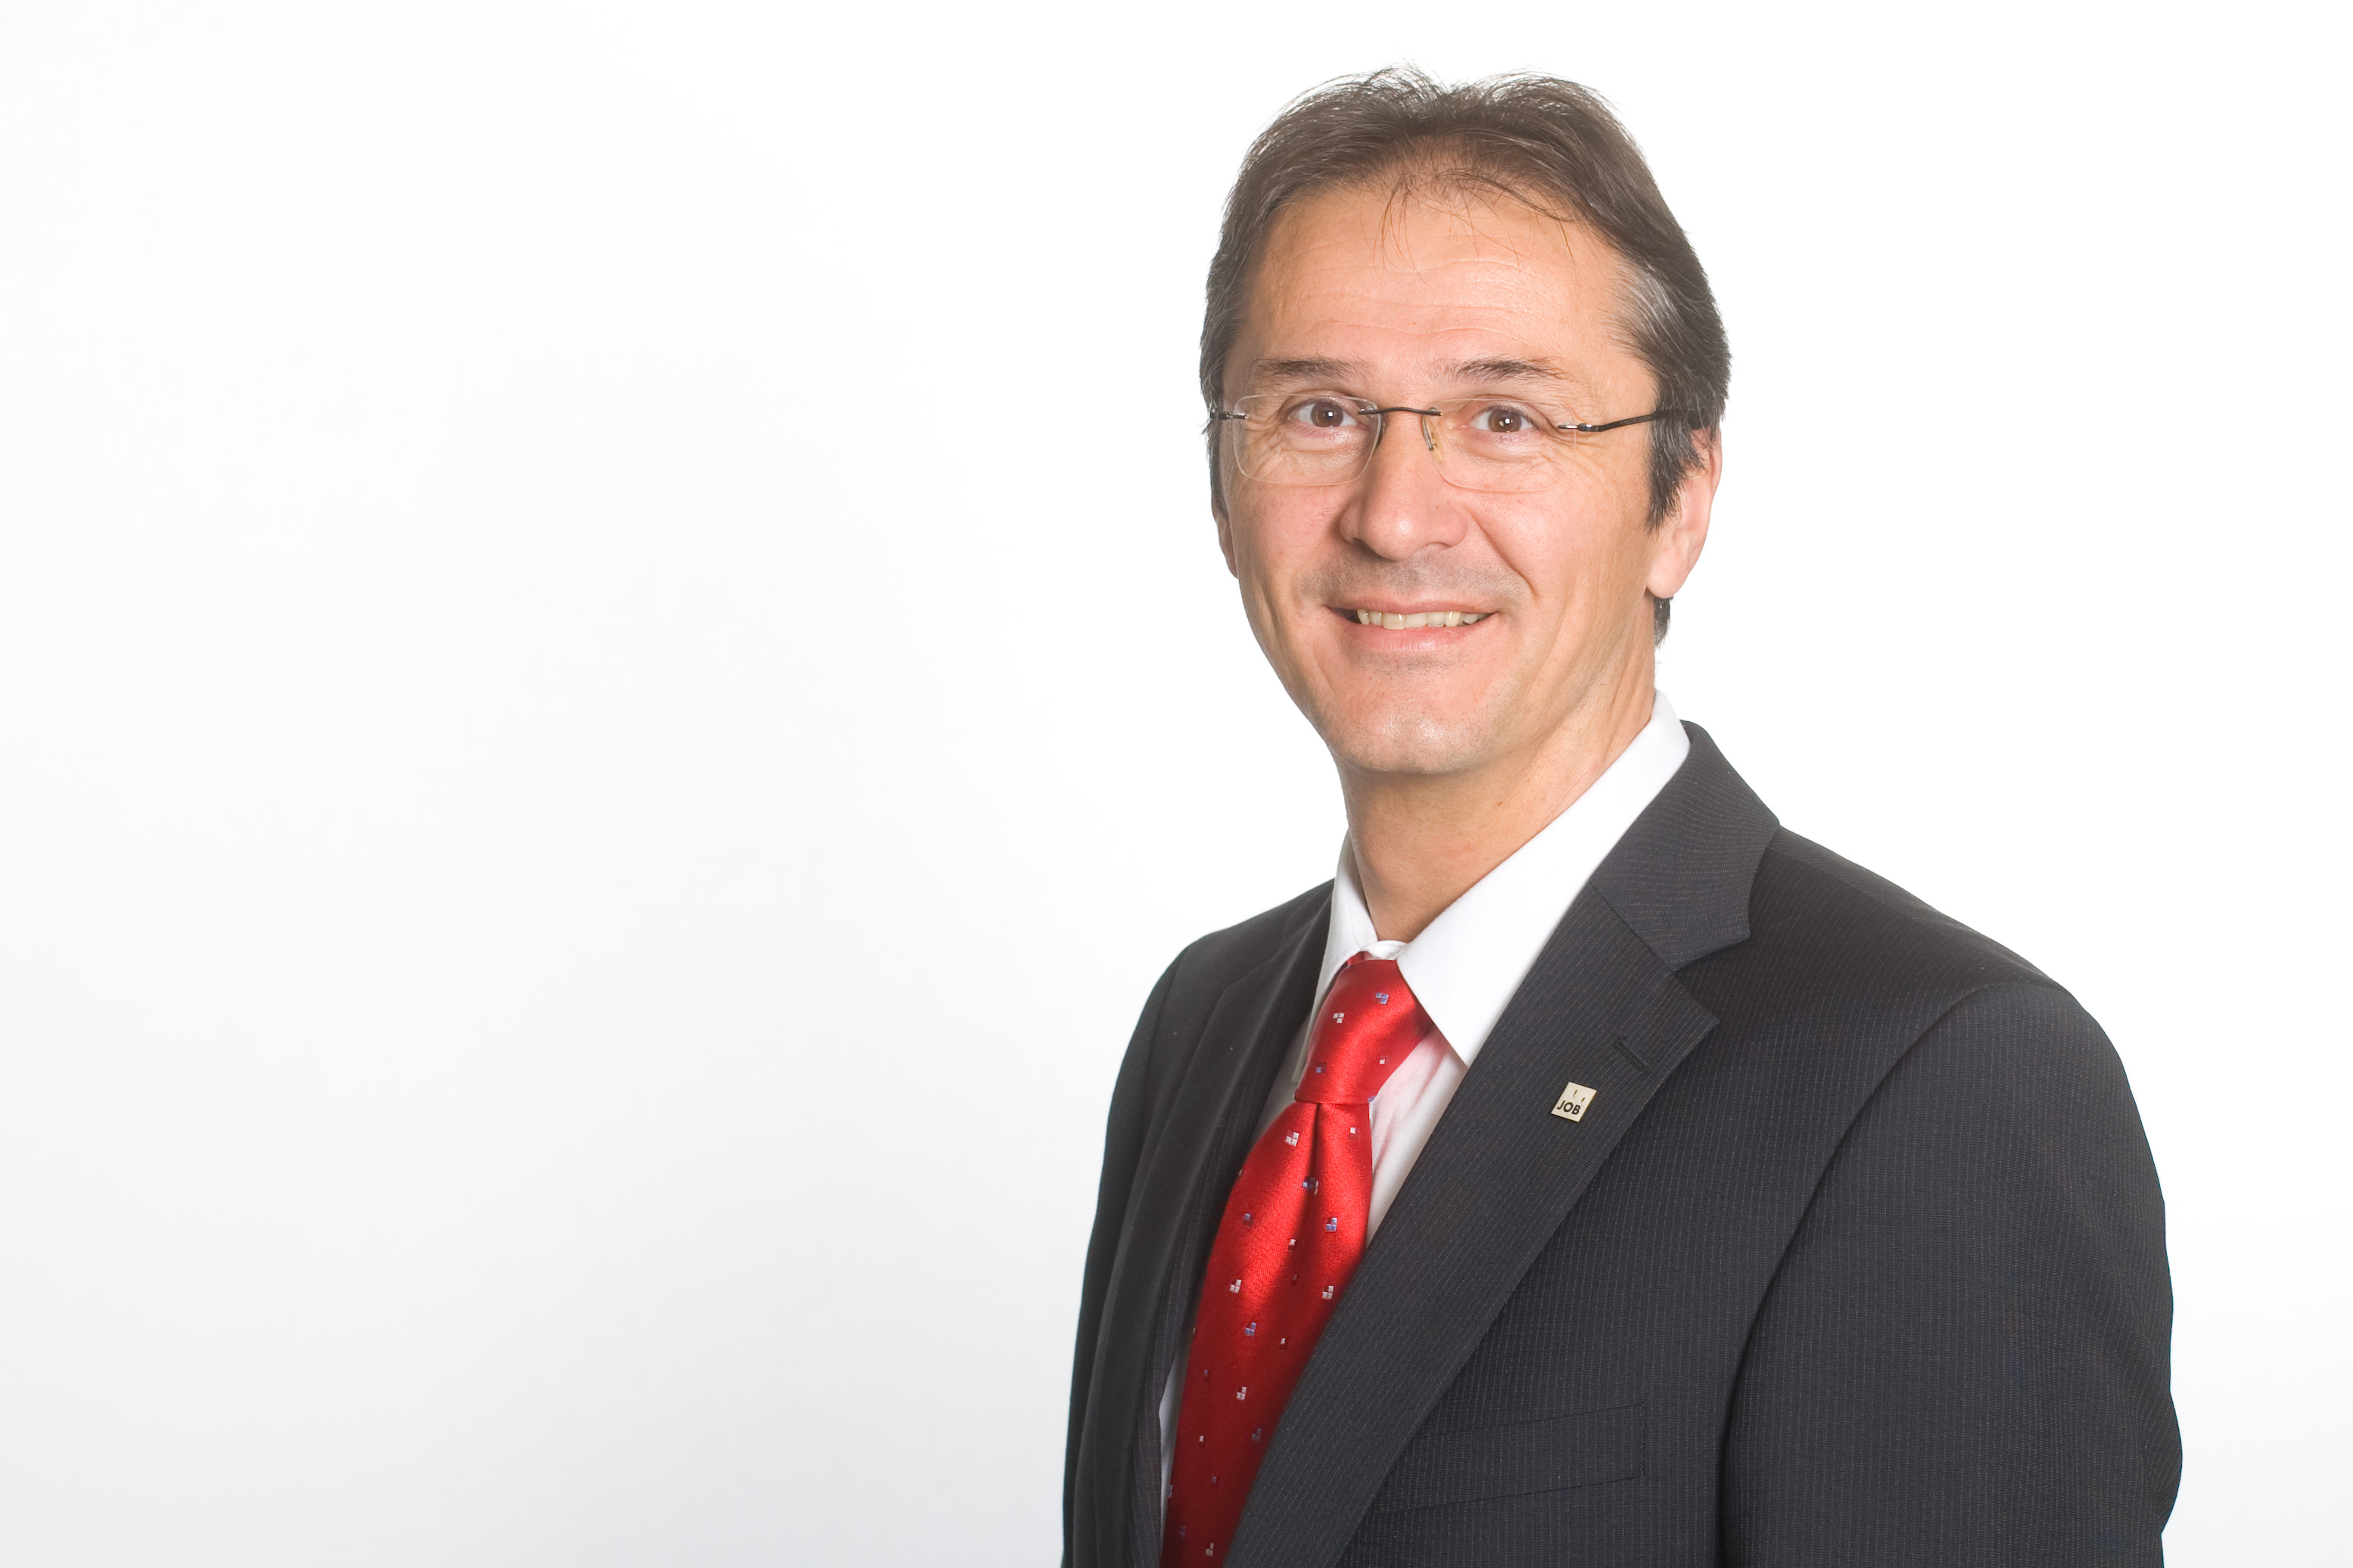 Matthias Krieger